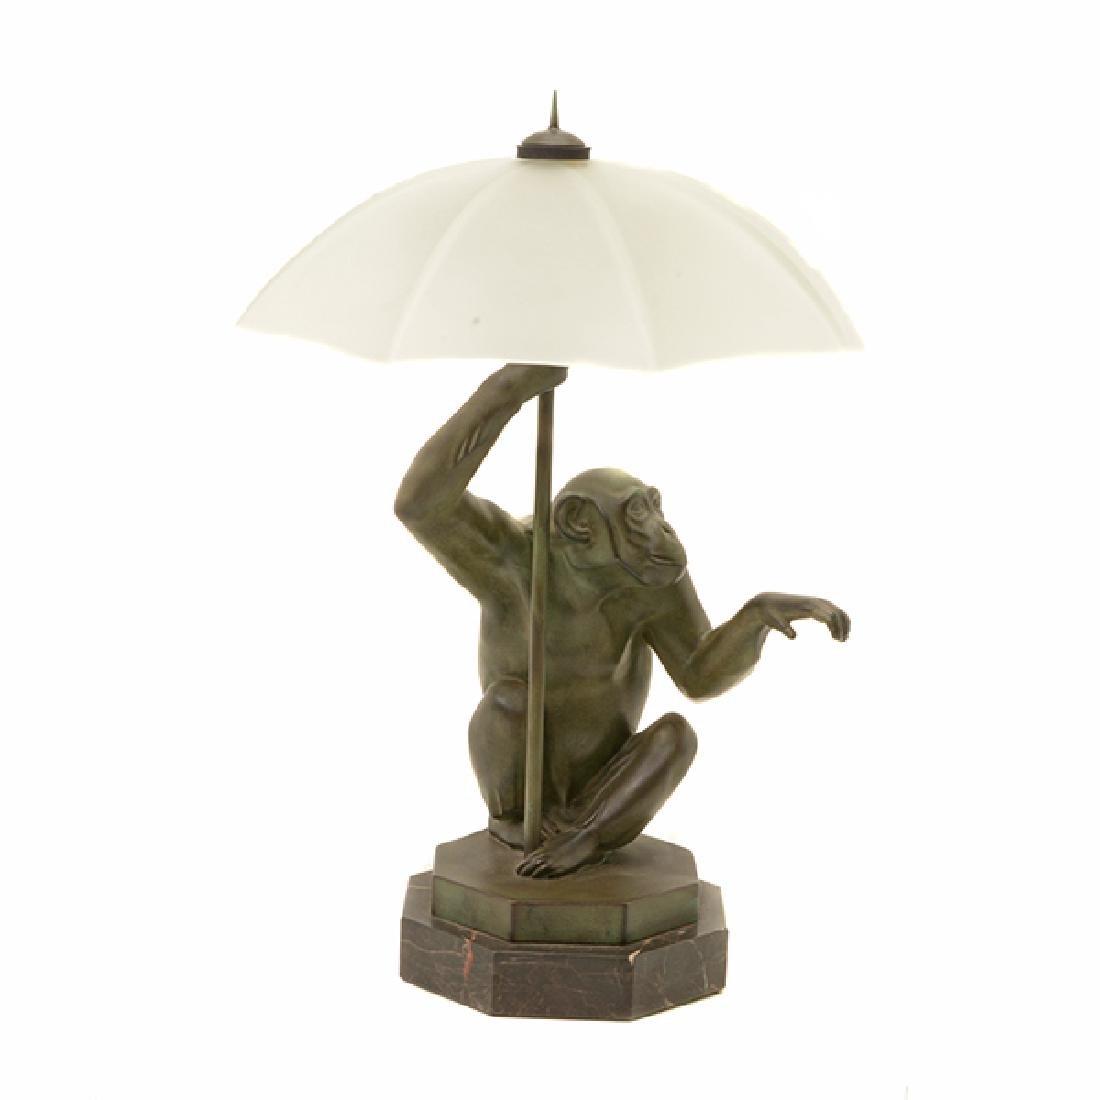 Bronze Monkey Figural Lamp with Glass Umbrella Form